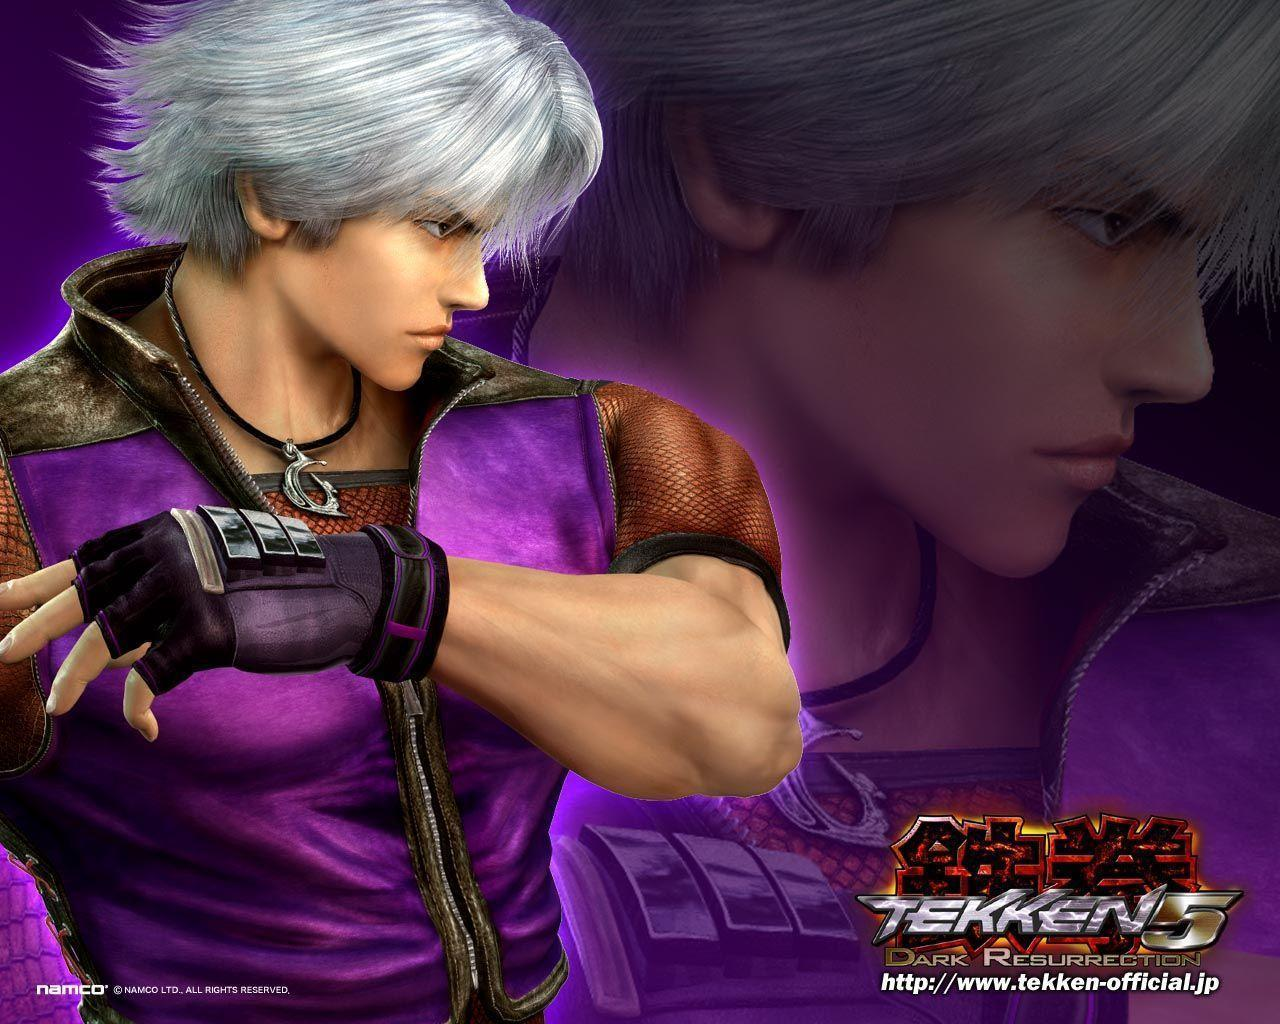 Dark Resurrection Wallpaper - Tekken Wallpaper (243889) - Fanpop